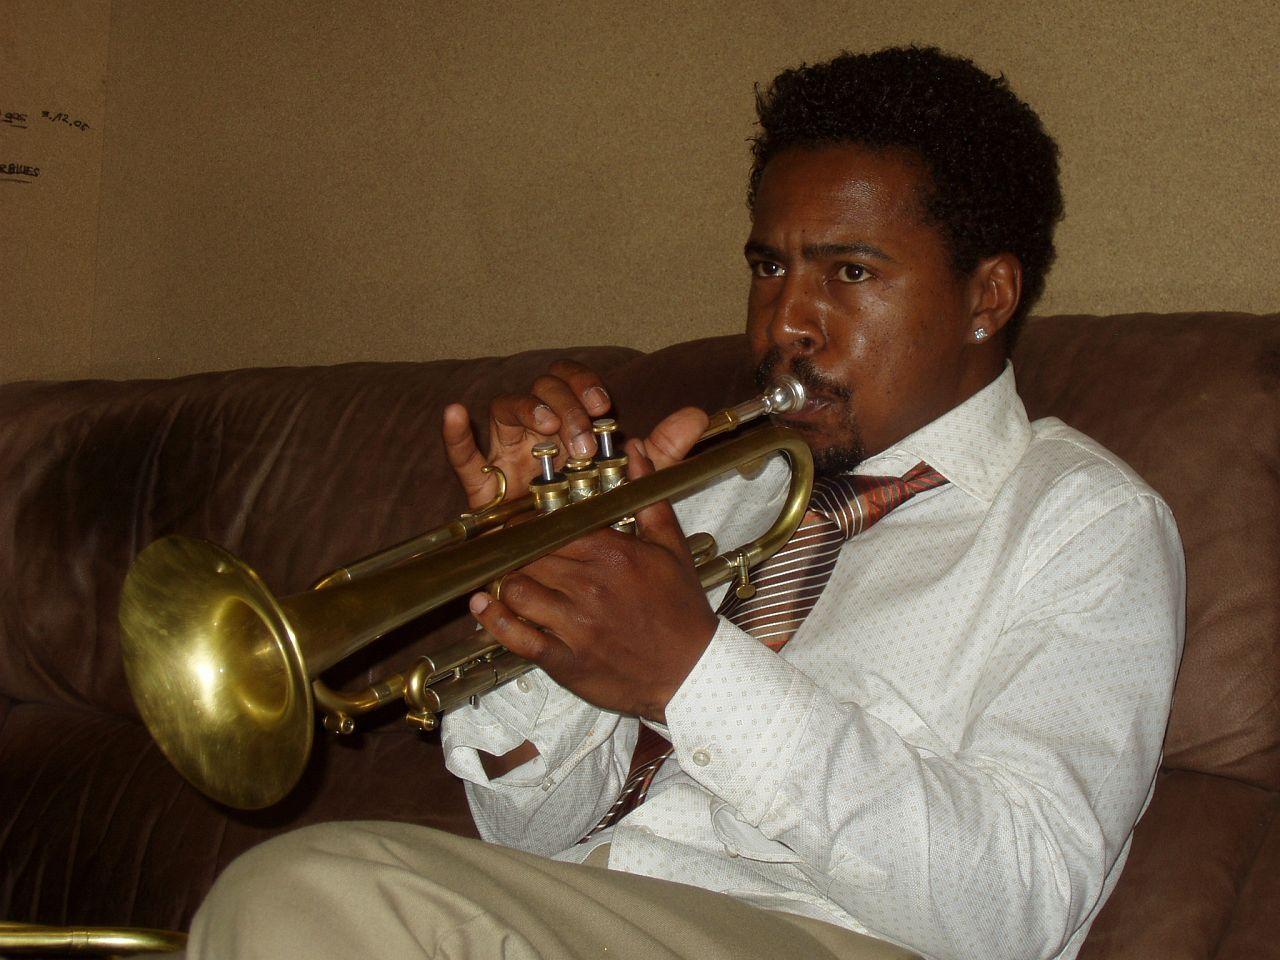 Musiker 292